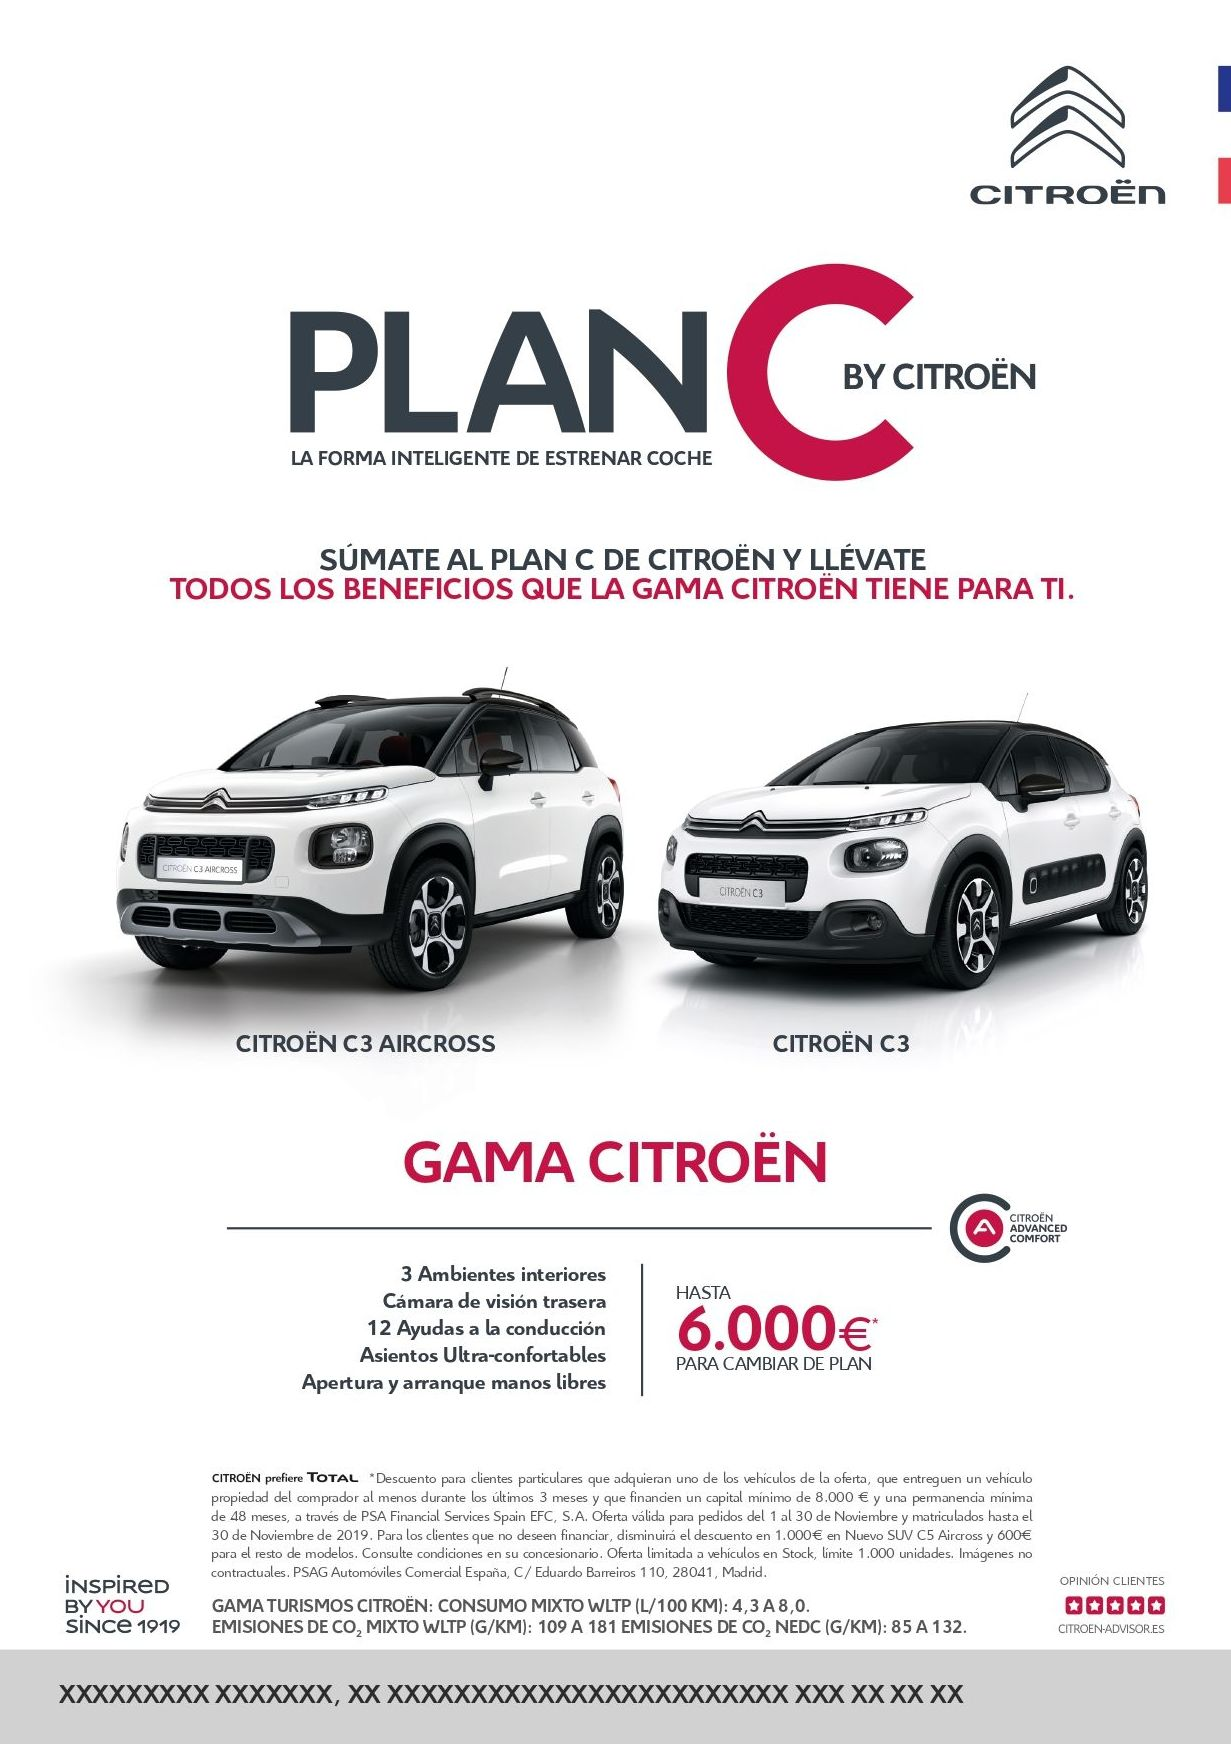 Plan C by Citröen